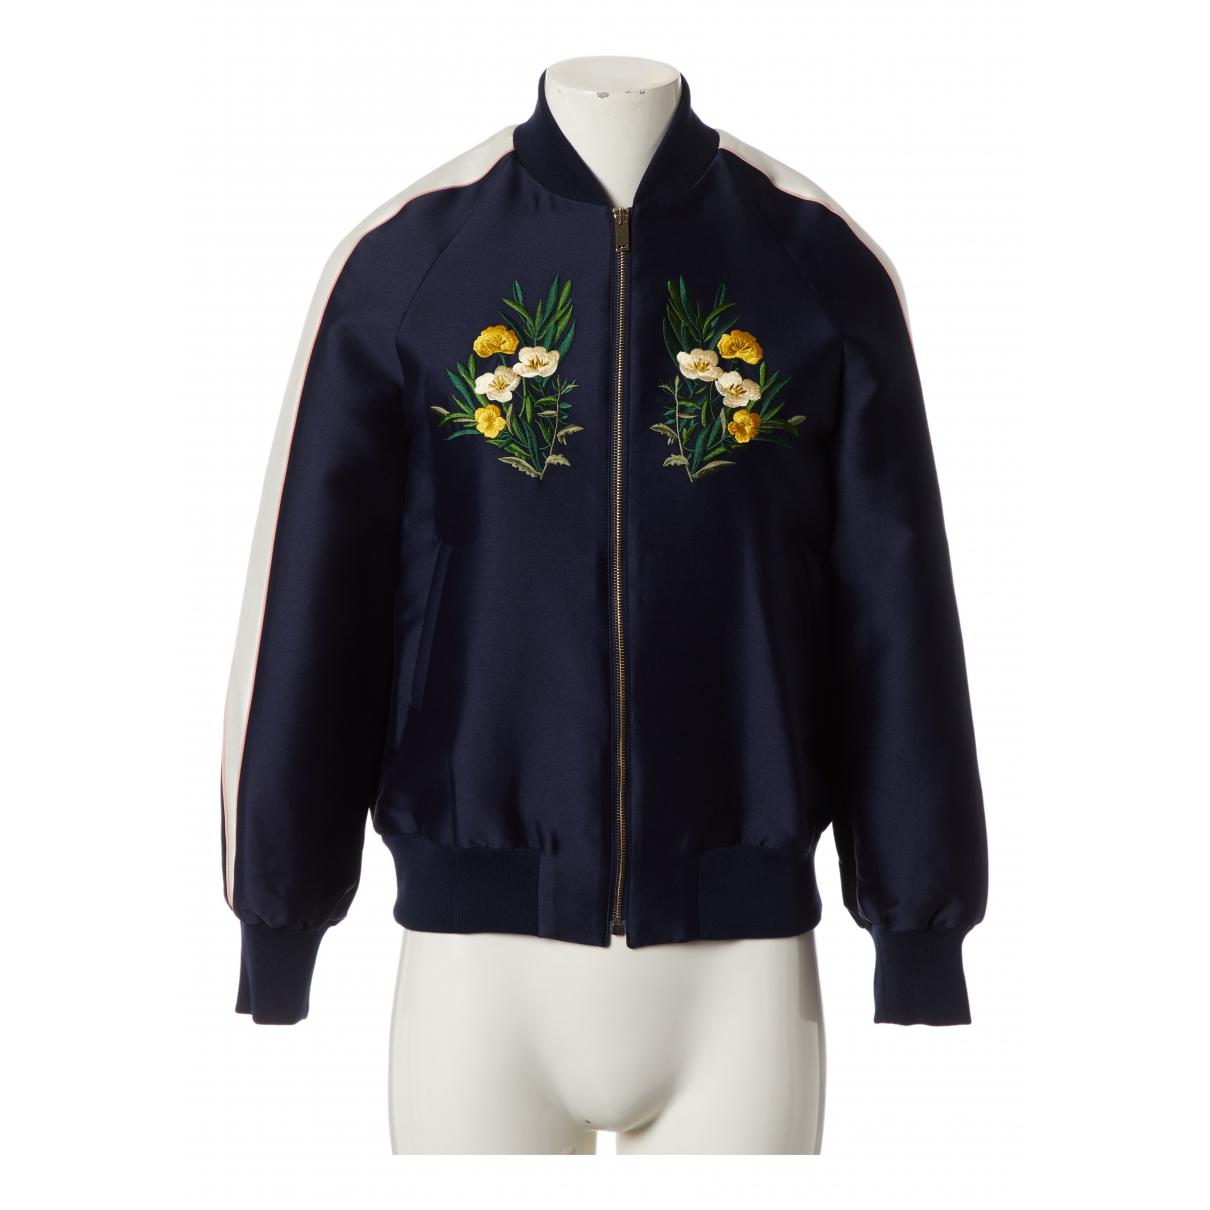 Stella Mccartney N Multicolour Cotton jacket for Women 34 FR